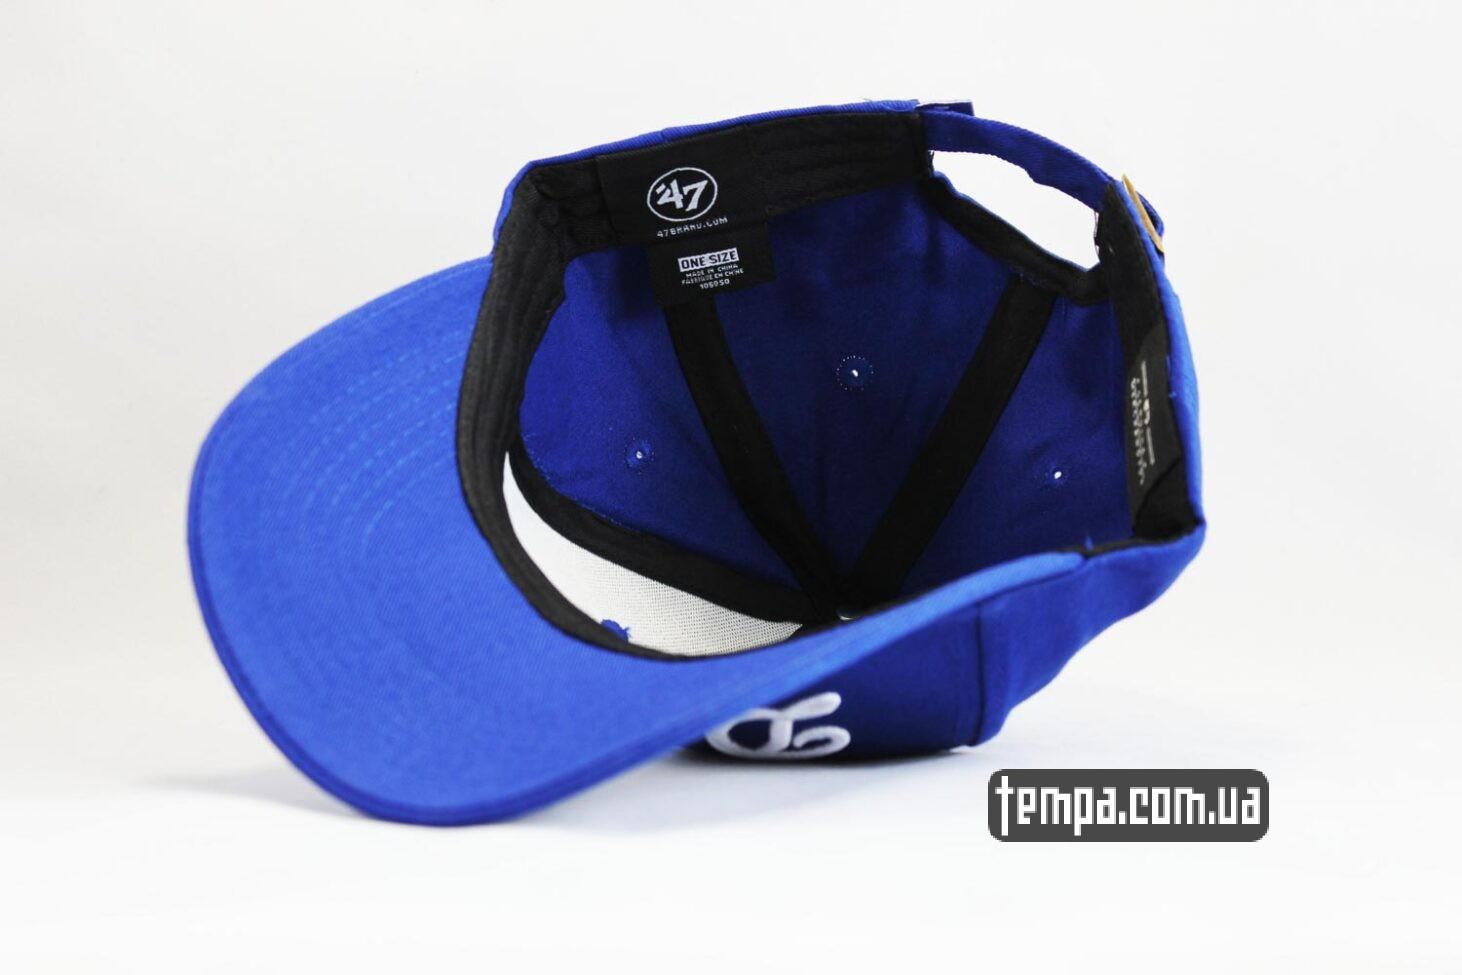 47 New York NYC кепка snapback бейсболка Dodgers 47 New Era синяя купить